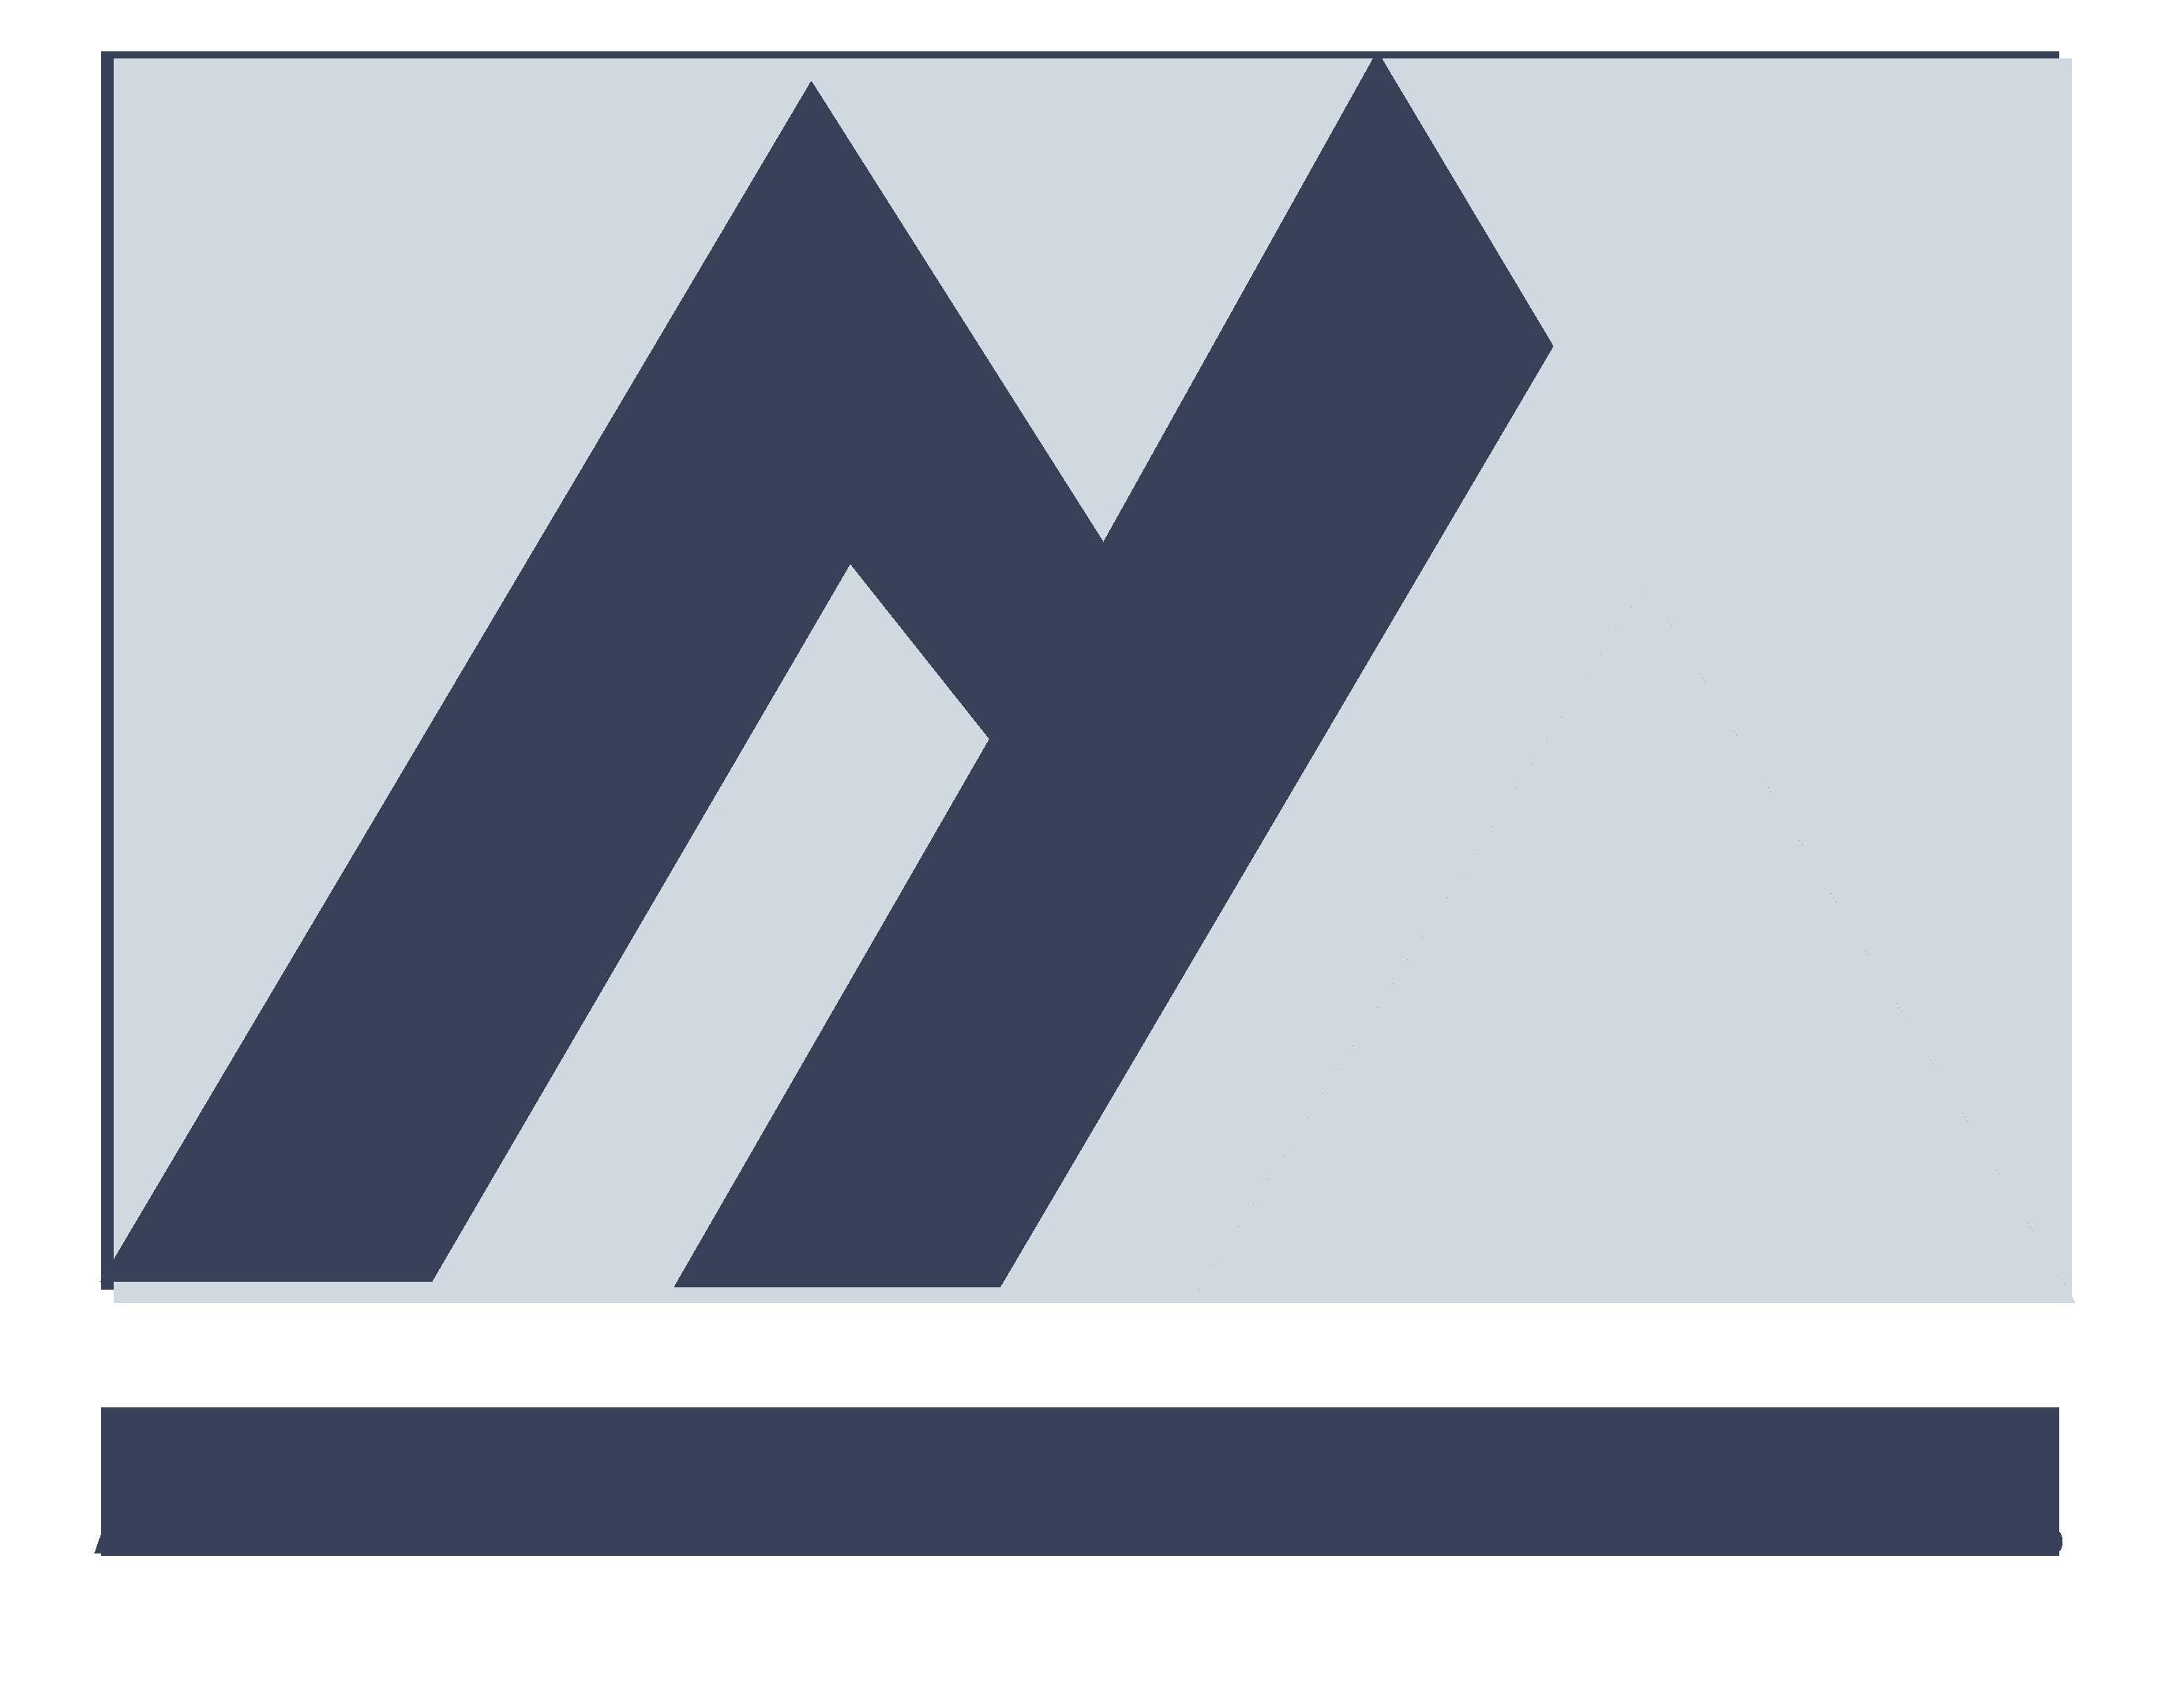 Almaden Identifies New High Priority Exploration Target at the Ixtaca Property